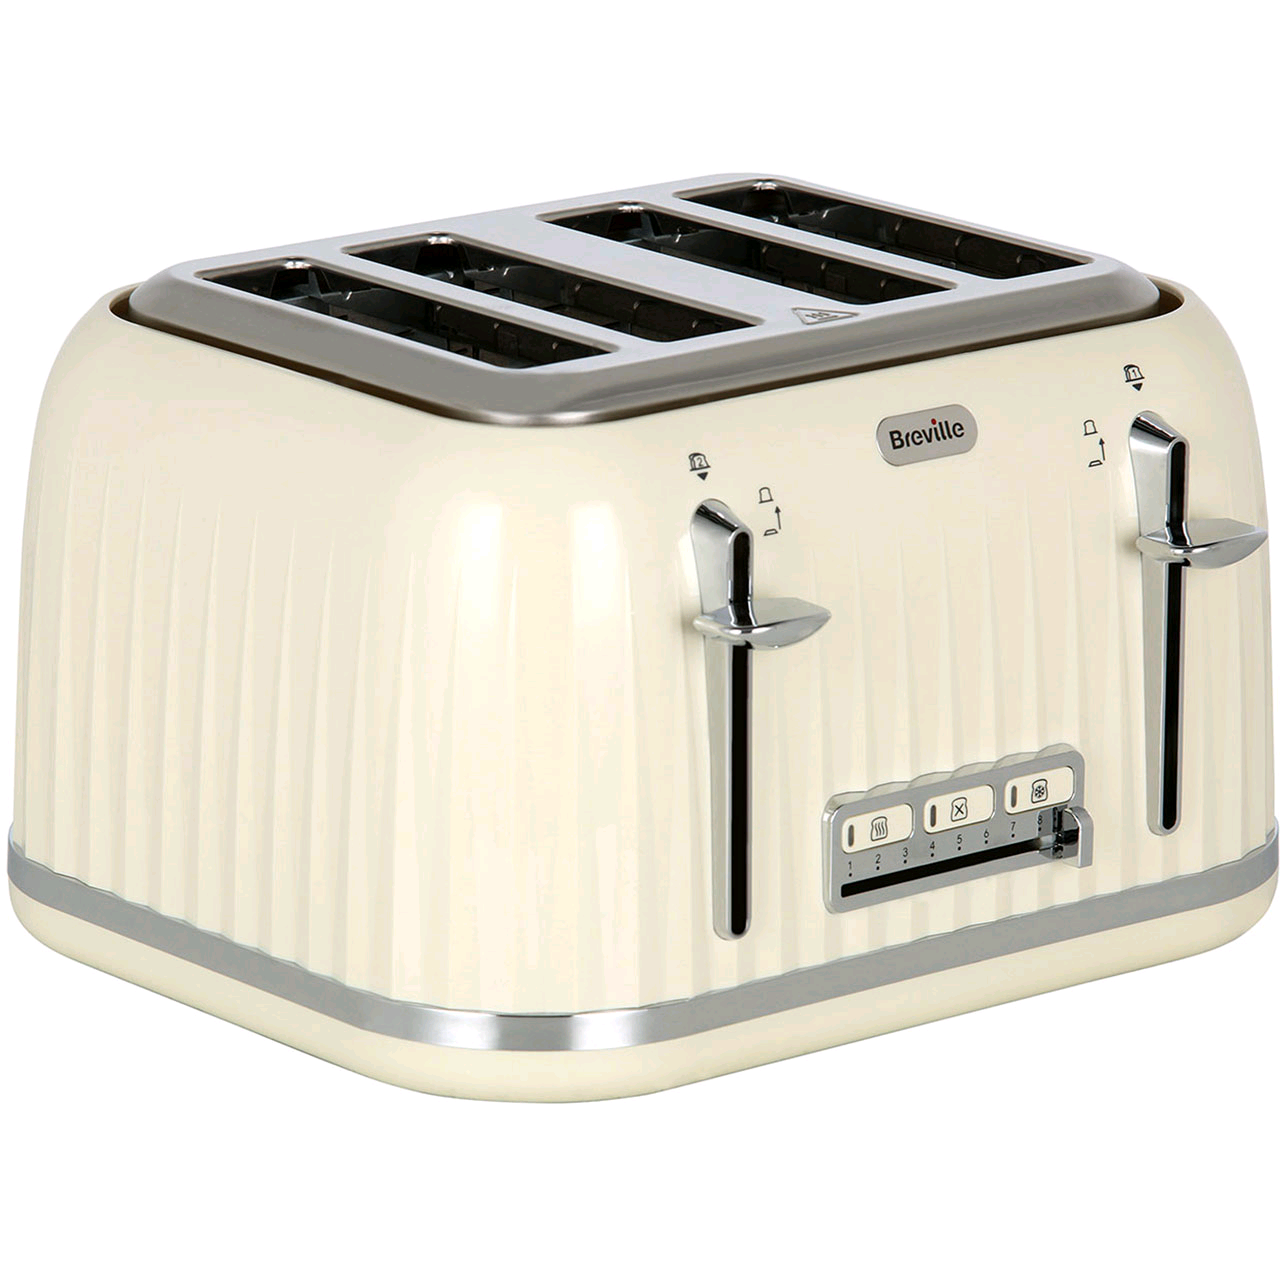 Breville Impressions 4 Slice Toaster Cream